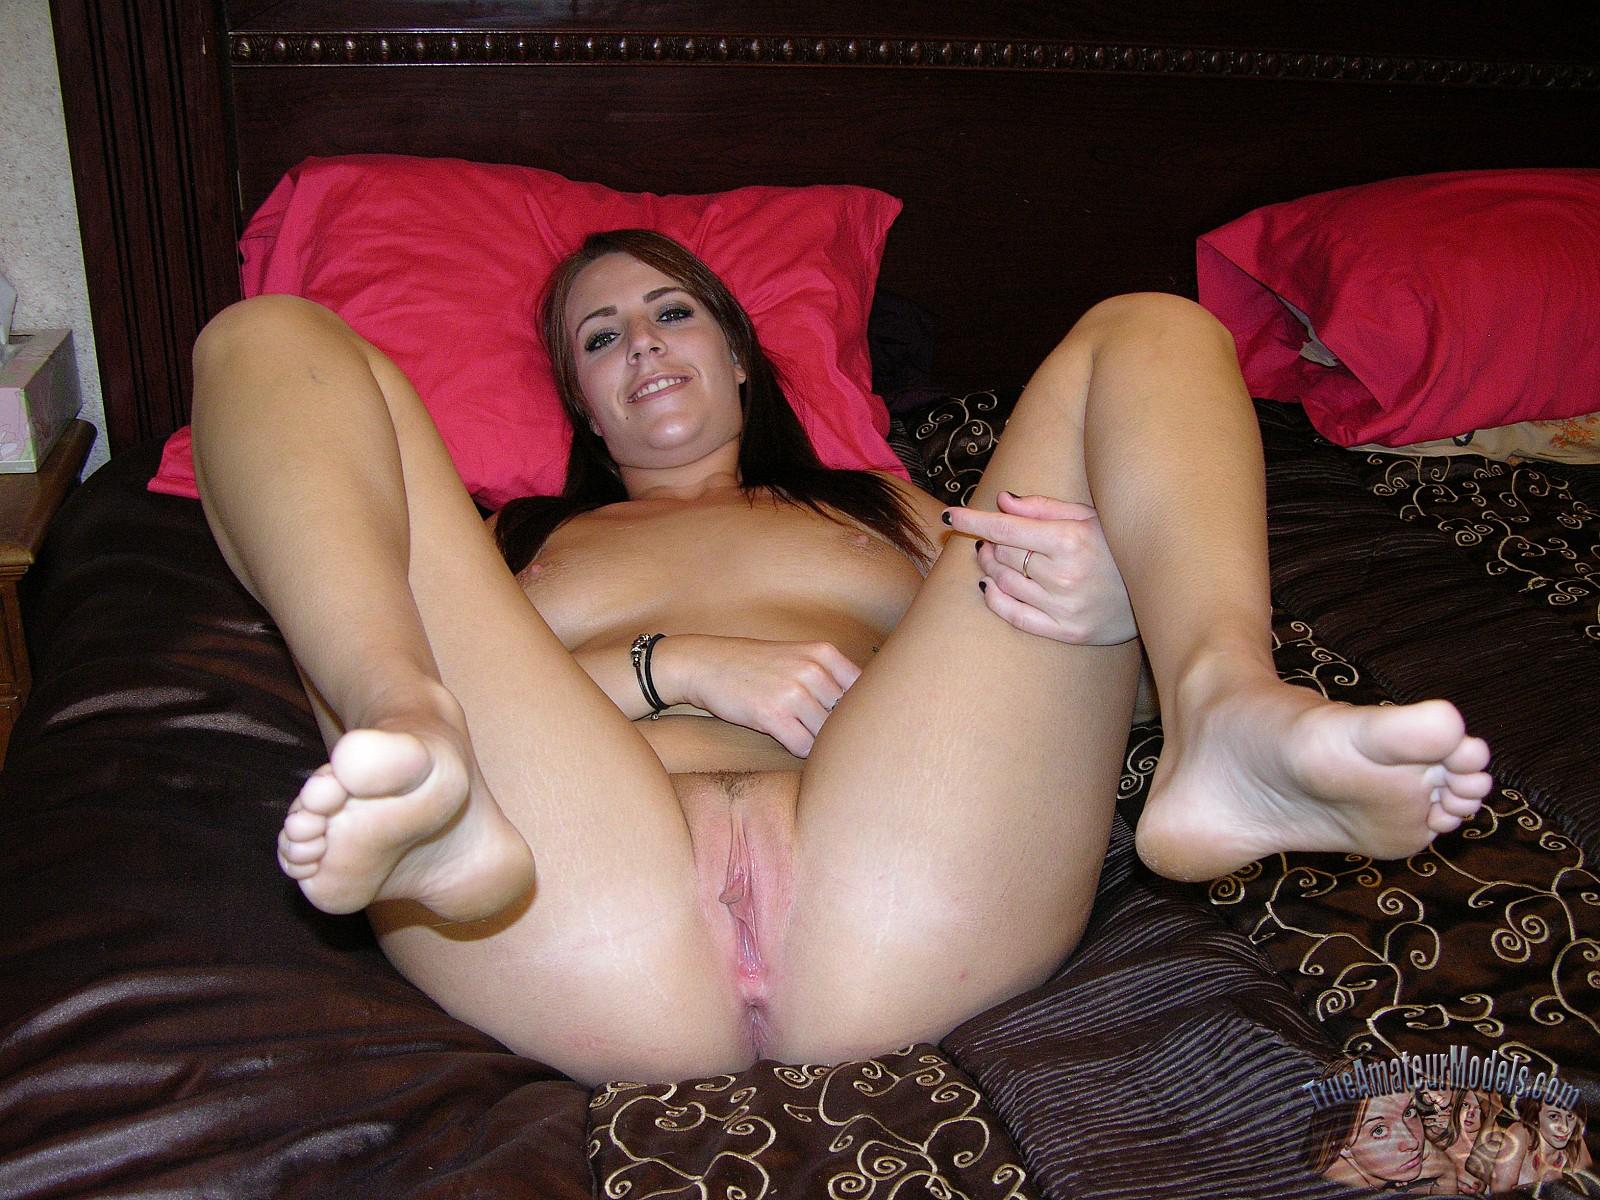 Real nude girls